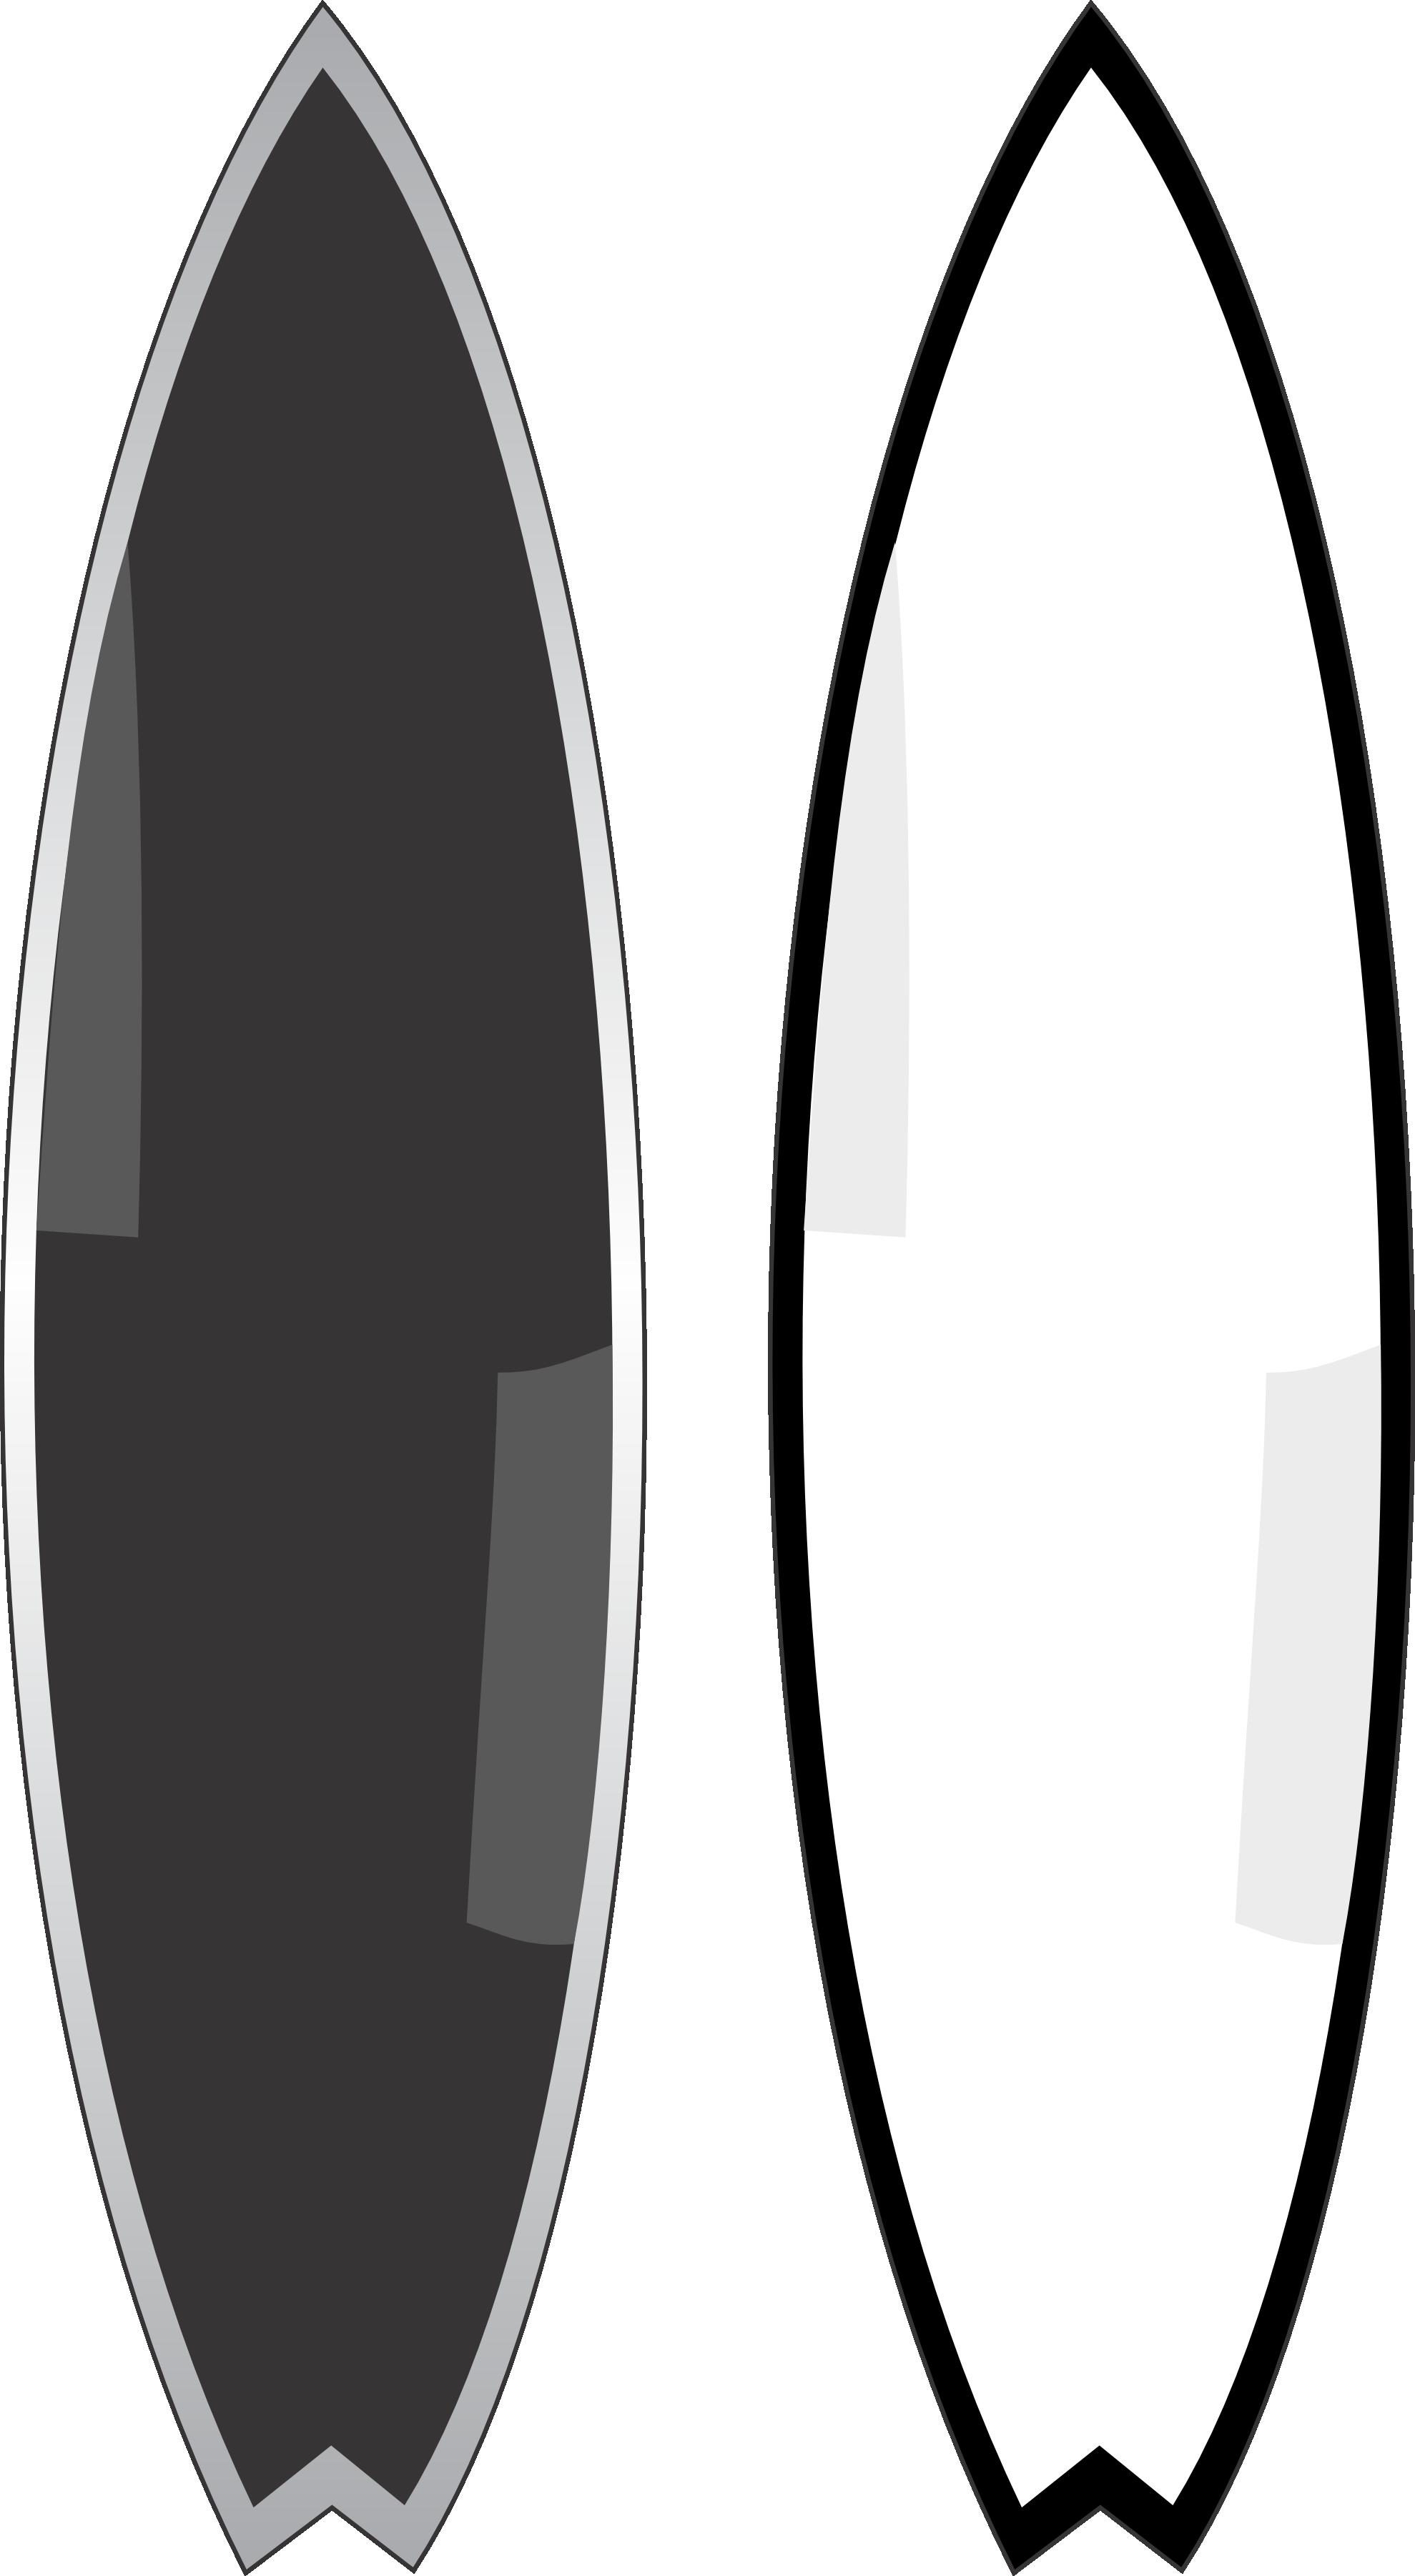 Templates  clipart surfboard Clipart surfing surfboard 5 surfboard